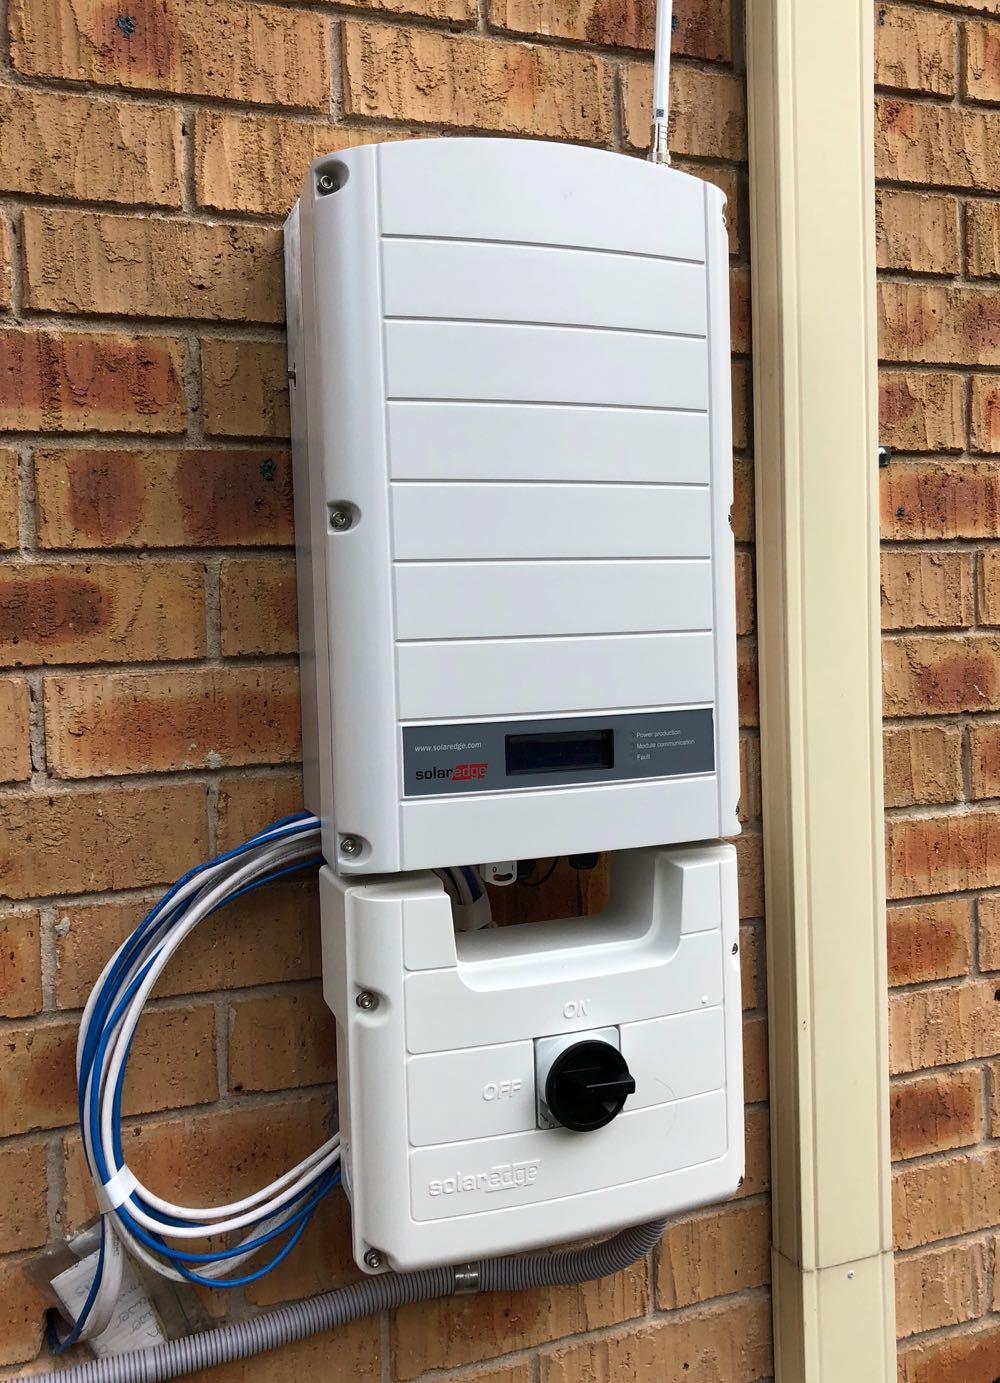 Our SolarEdge inverter